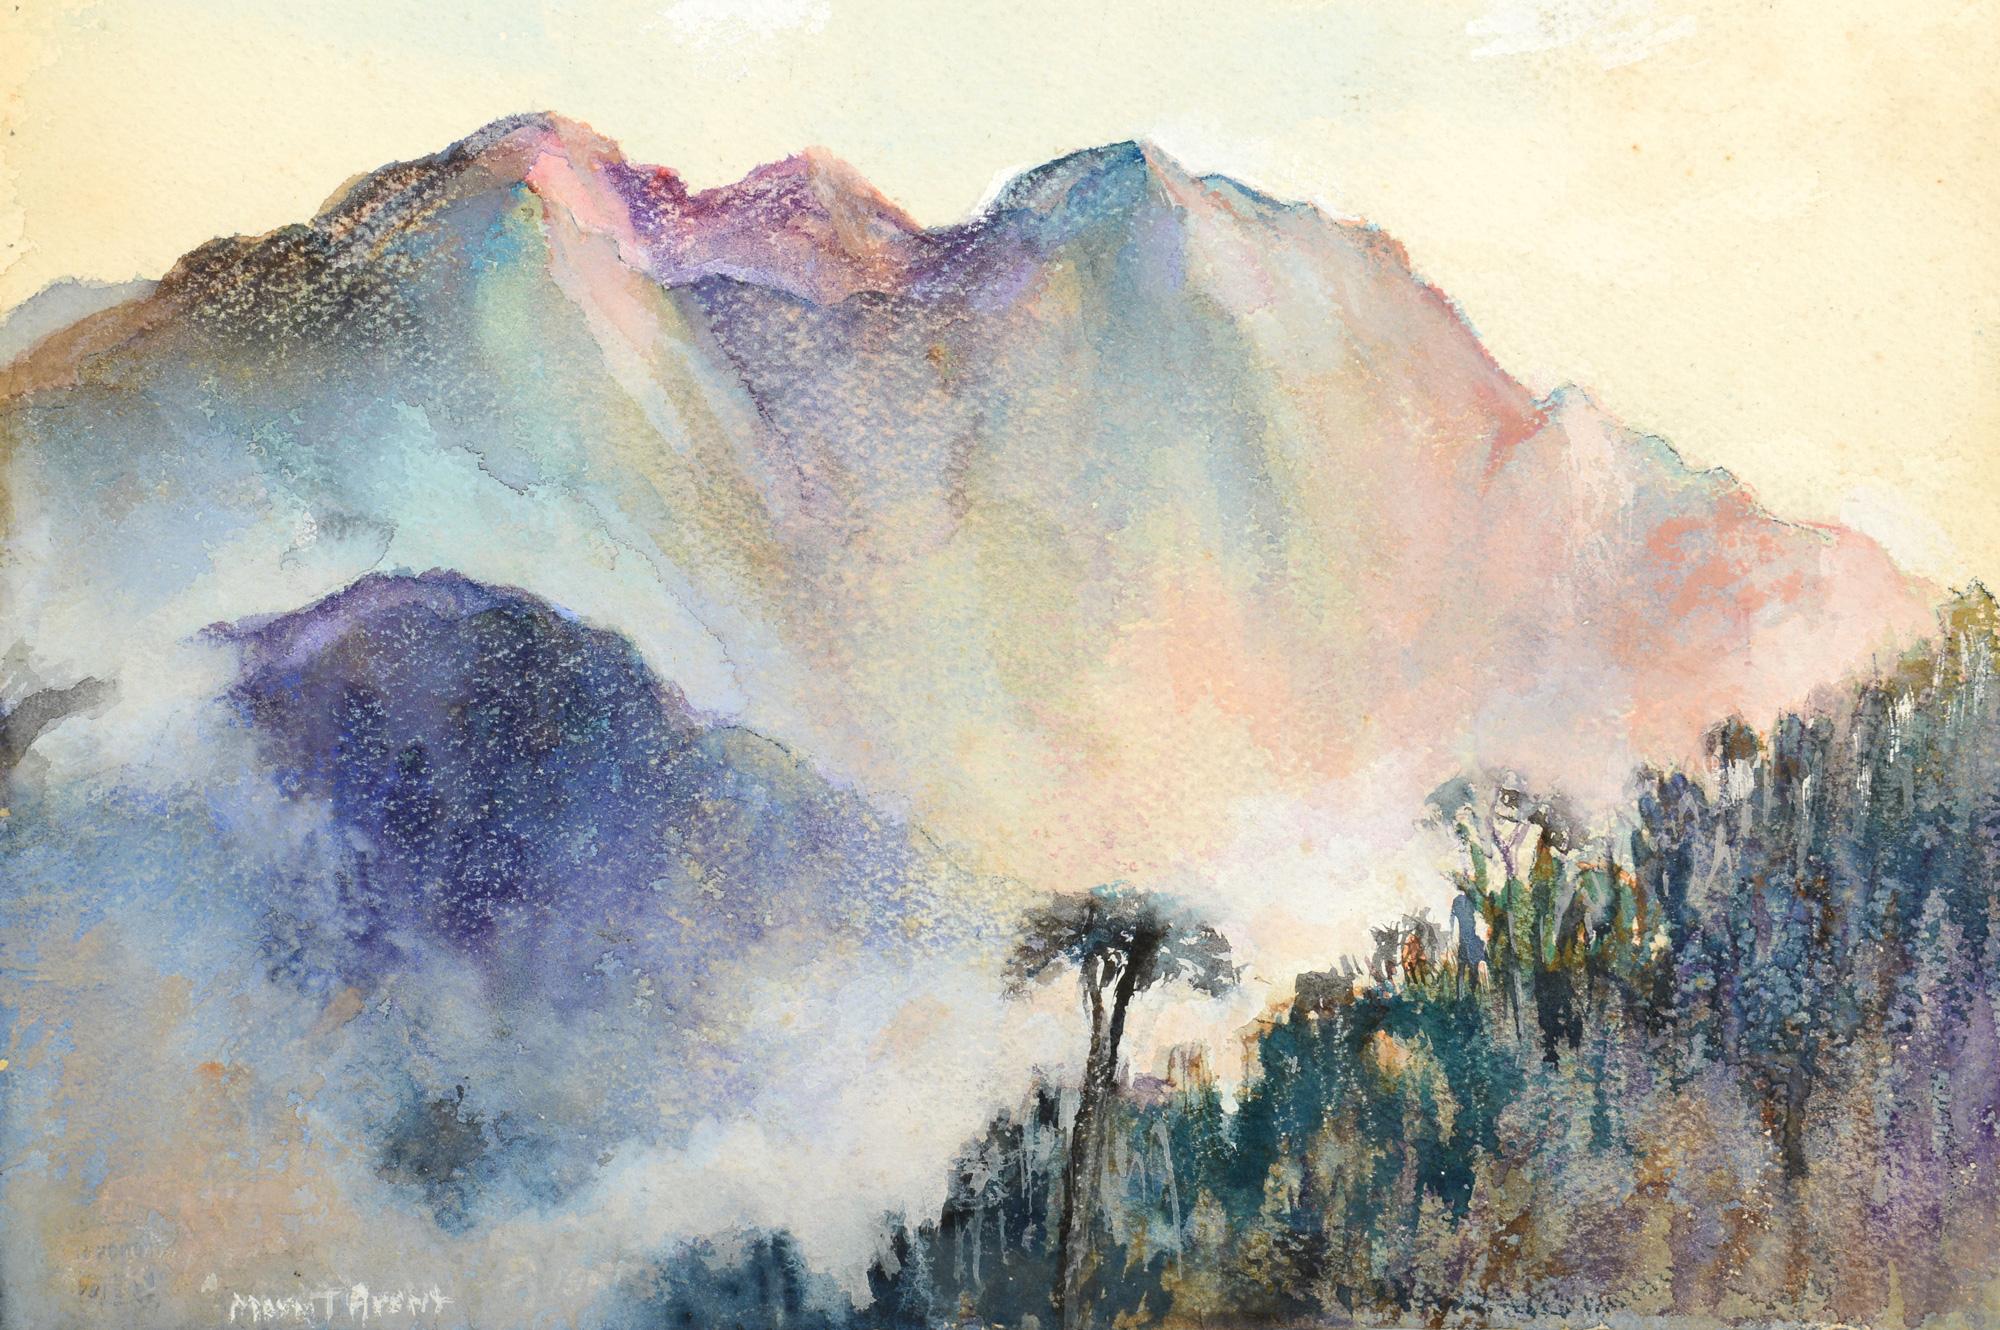 2000x1330 Lot 724 Mayna Treanor Avent Mountainous Watercolor